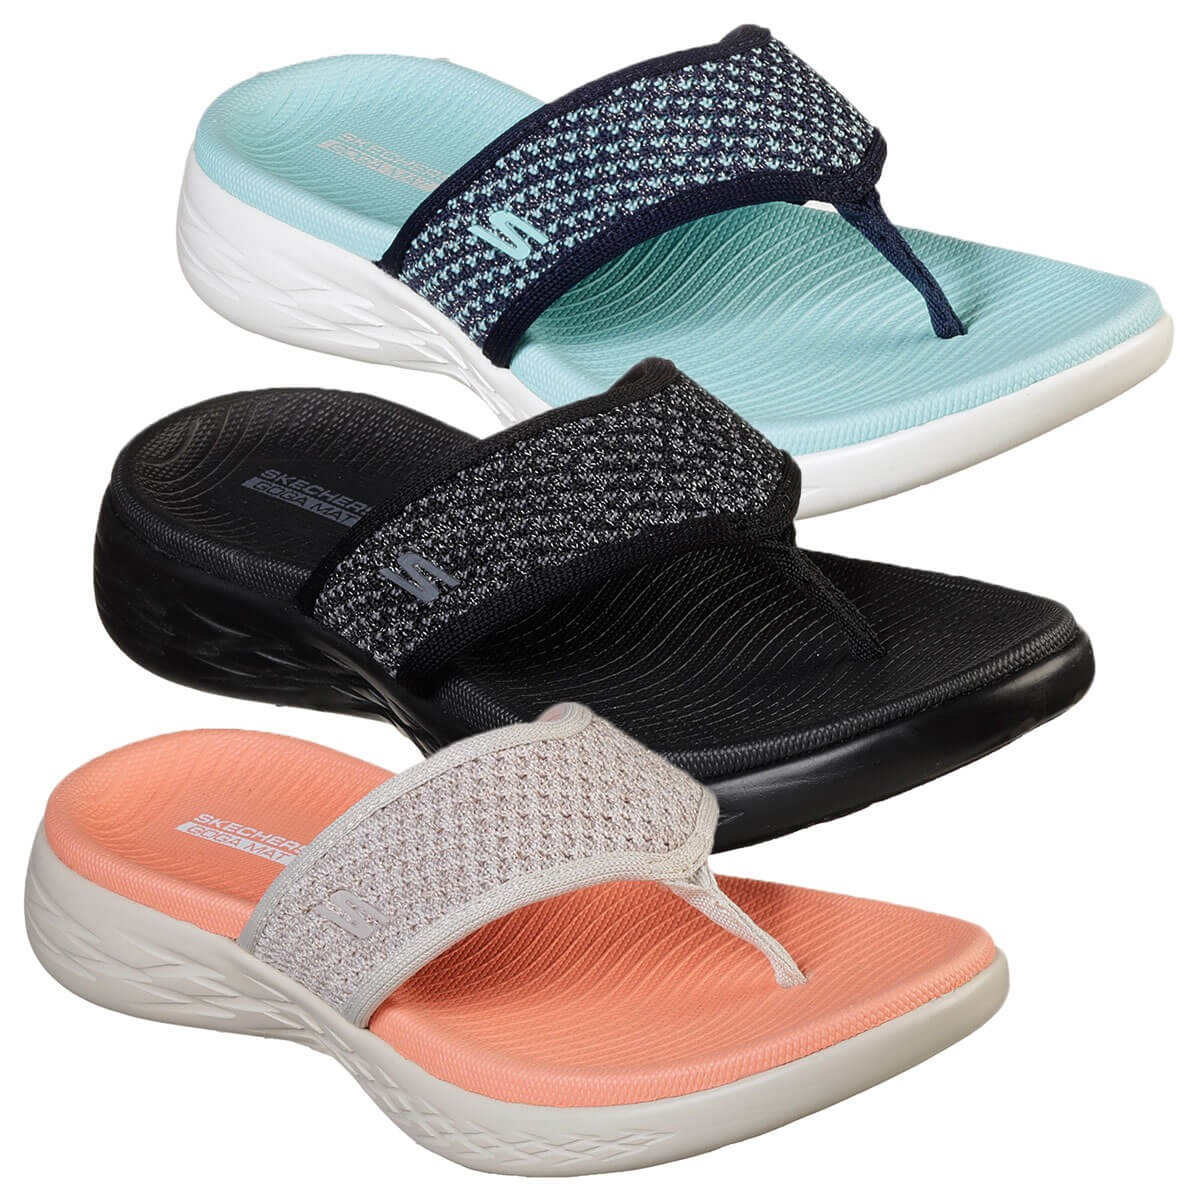 600 Glossy Memory Foam Comfort Sandals